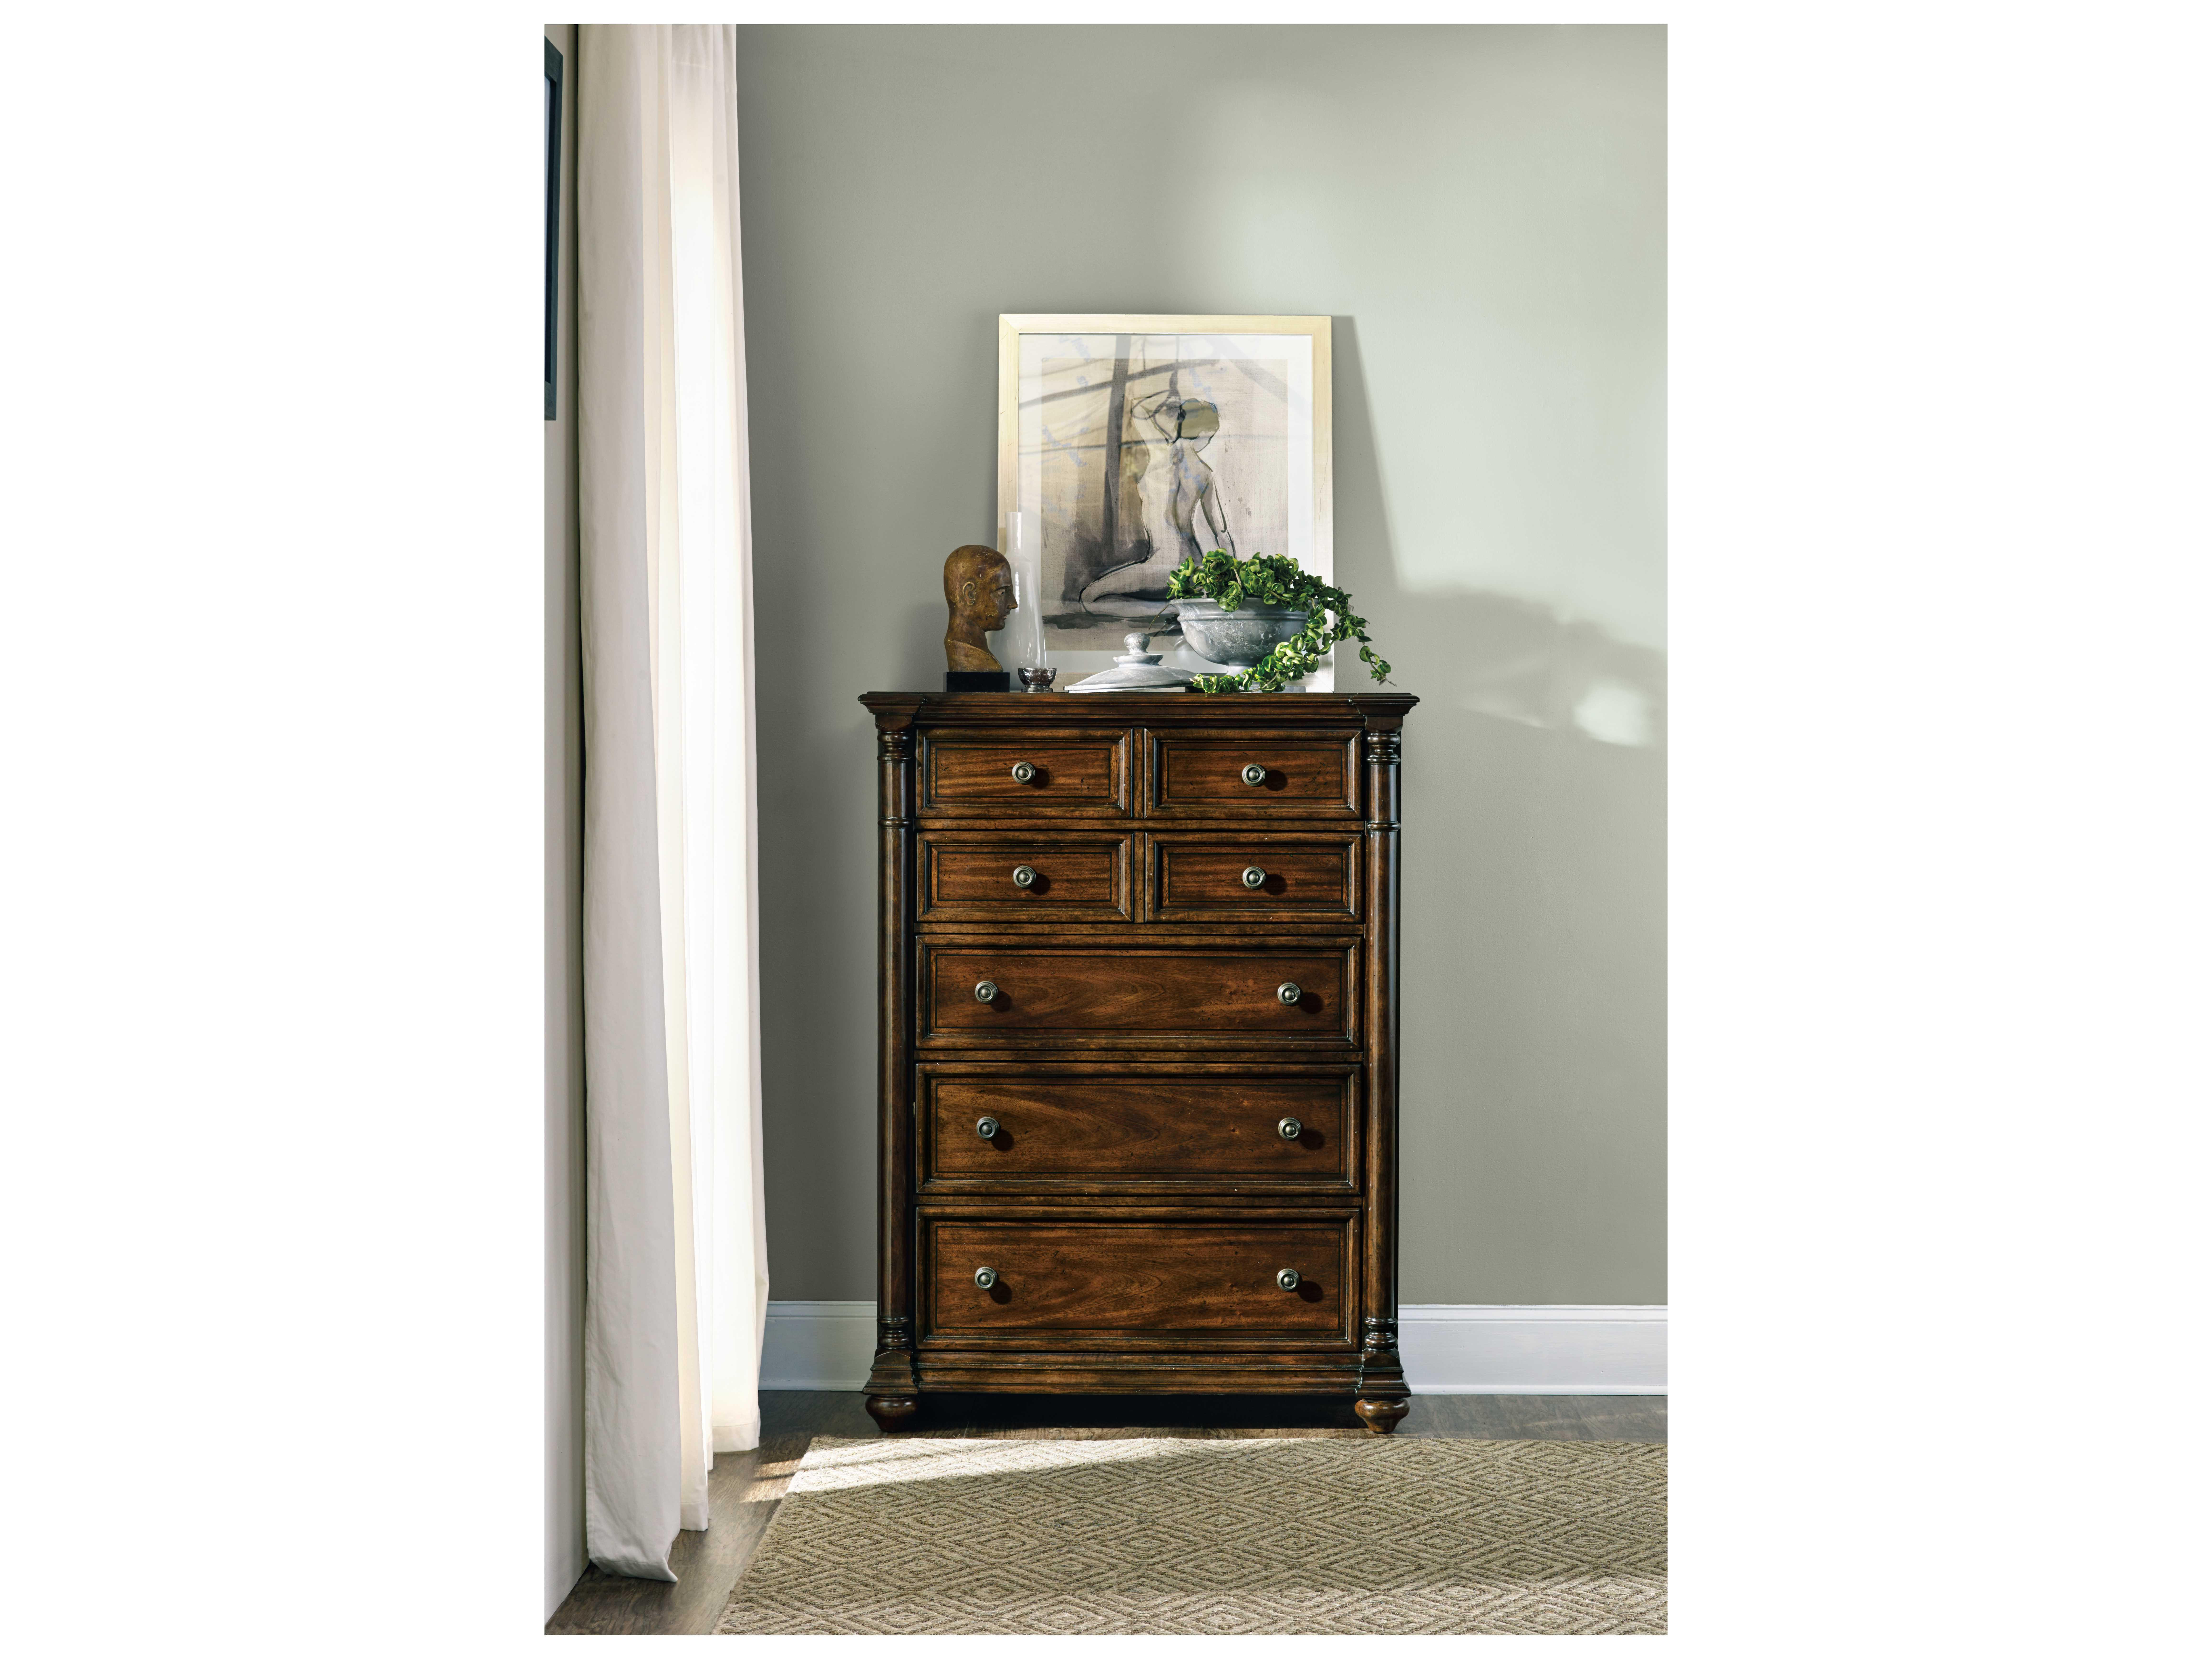 Hooker Furniture Leesburg Rich Traditional Mahogany 42 W X 20 D Rectangular Chest Of Drawers Hoo538190010